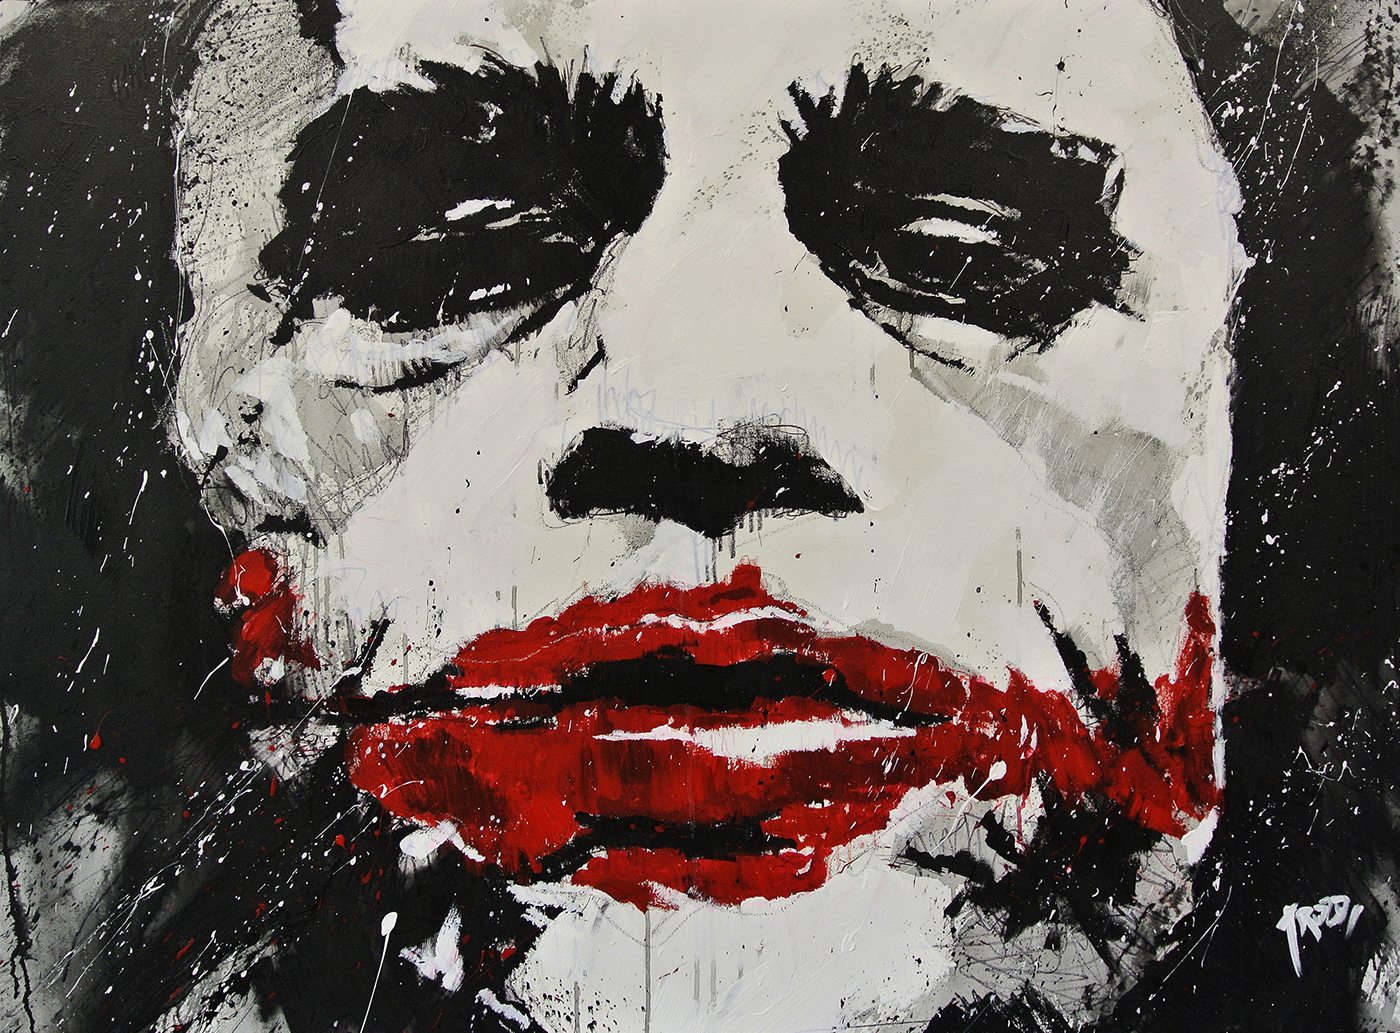 Painting of Heath Ledger as the Joker by Eduardo Valdivieso